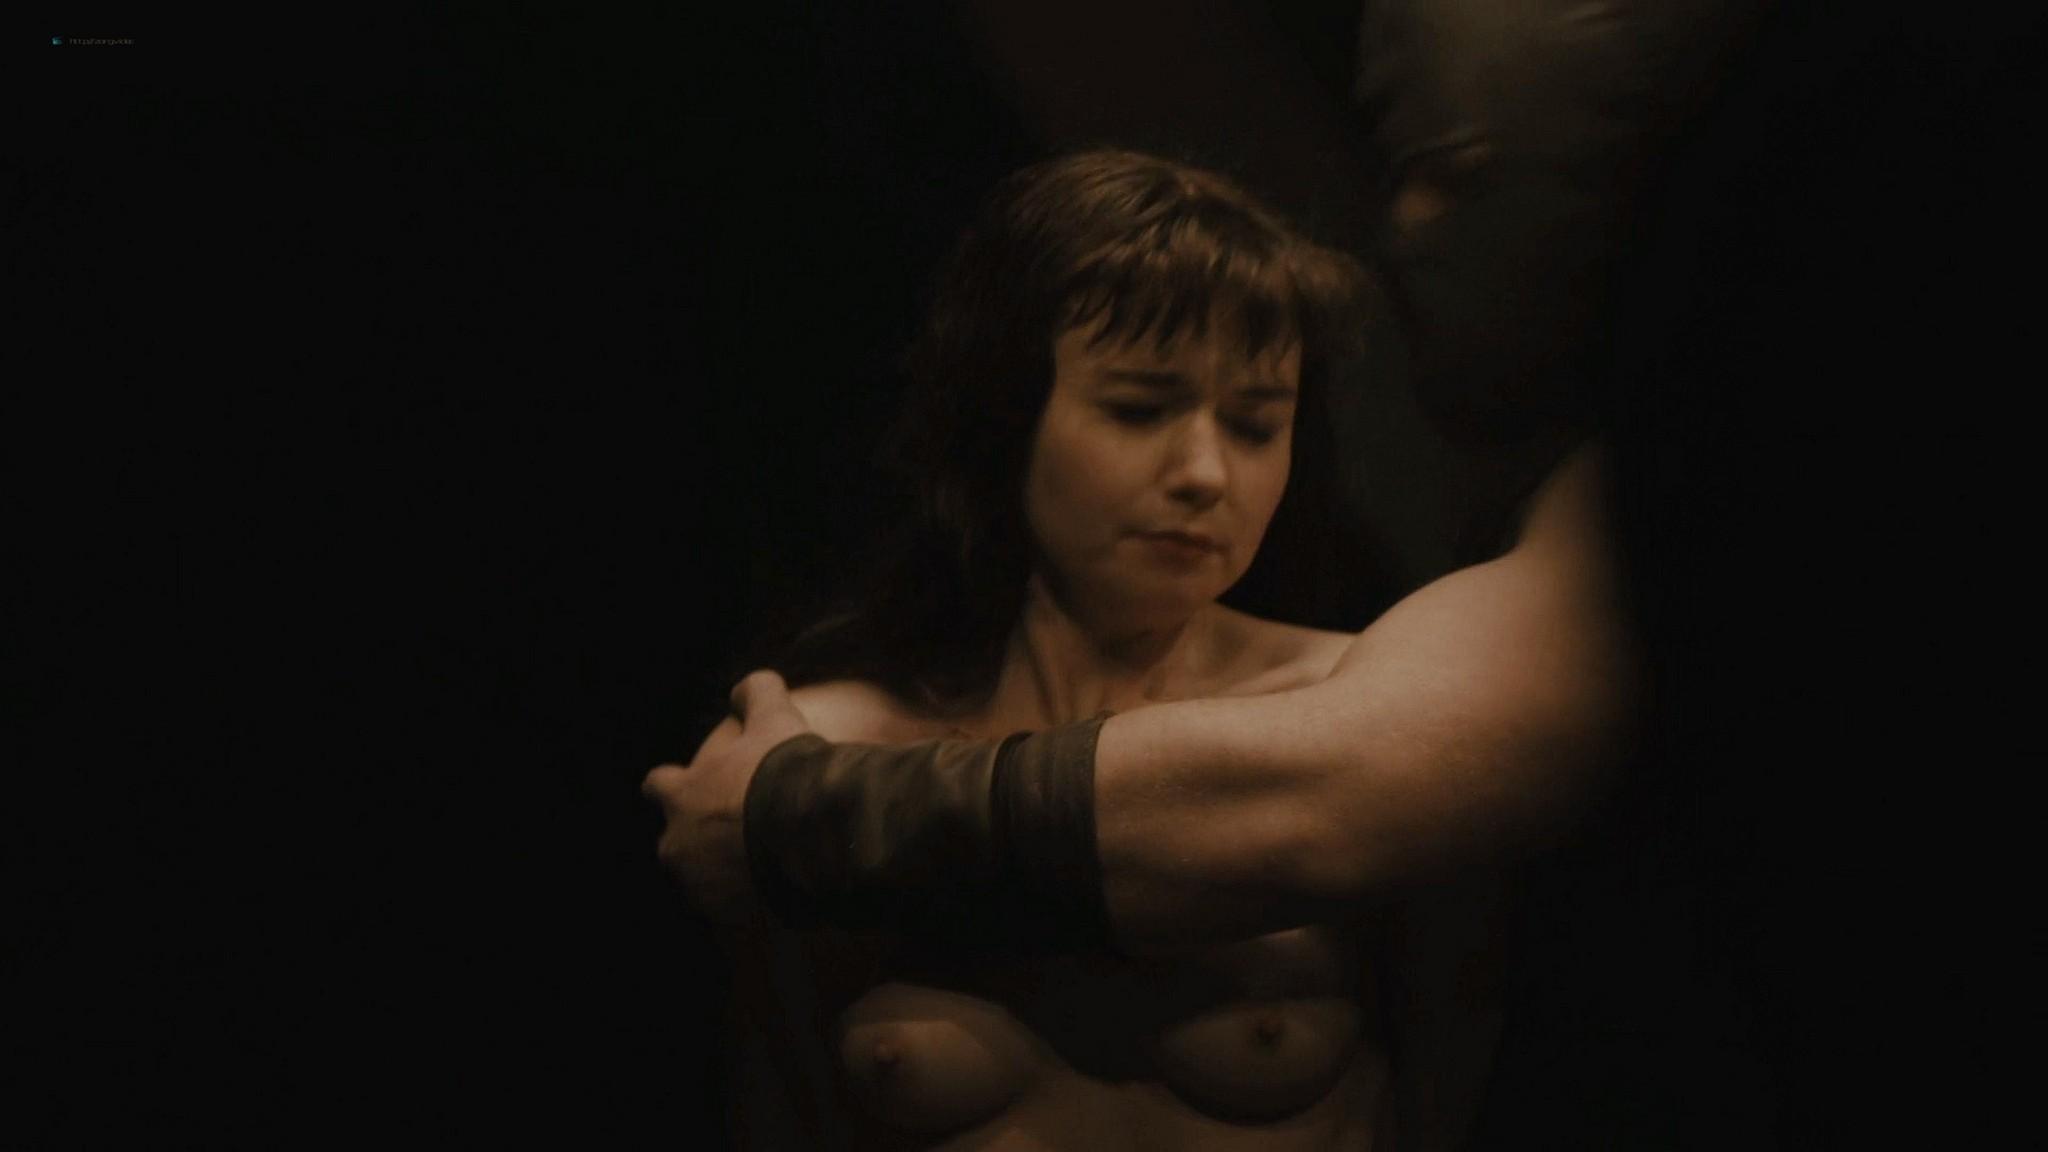 Jessica Barden nude full frontal, bush and boobs – Penny Dreadful s03e02 (2016) HD 1080p (5)